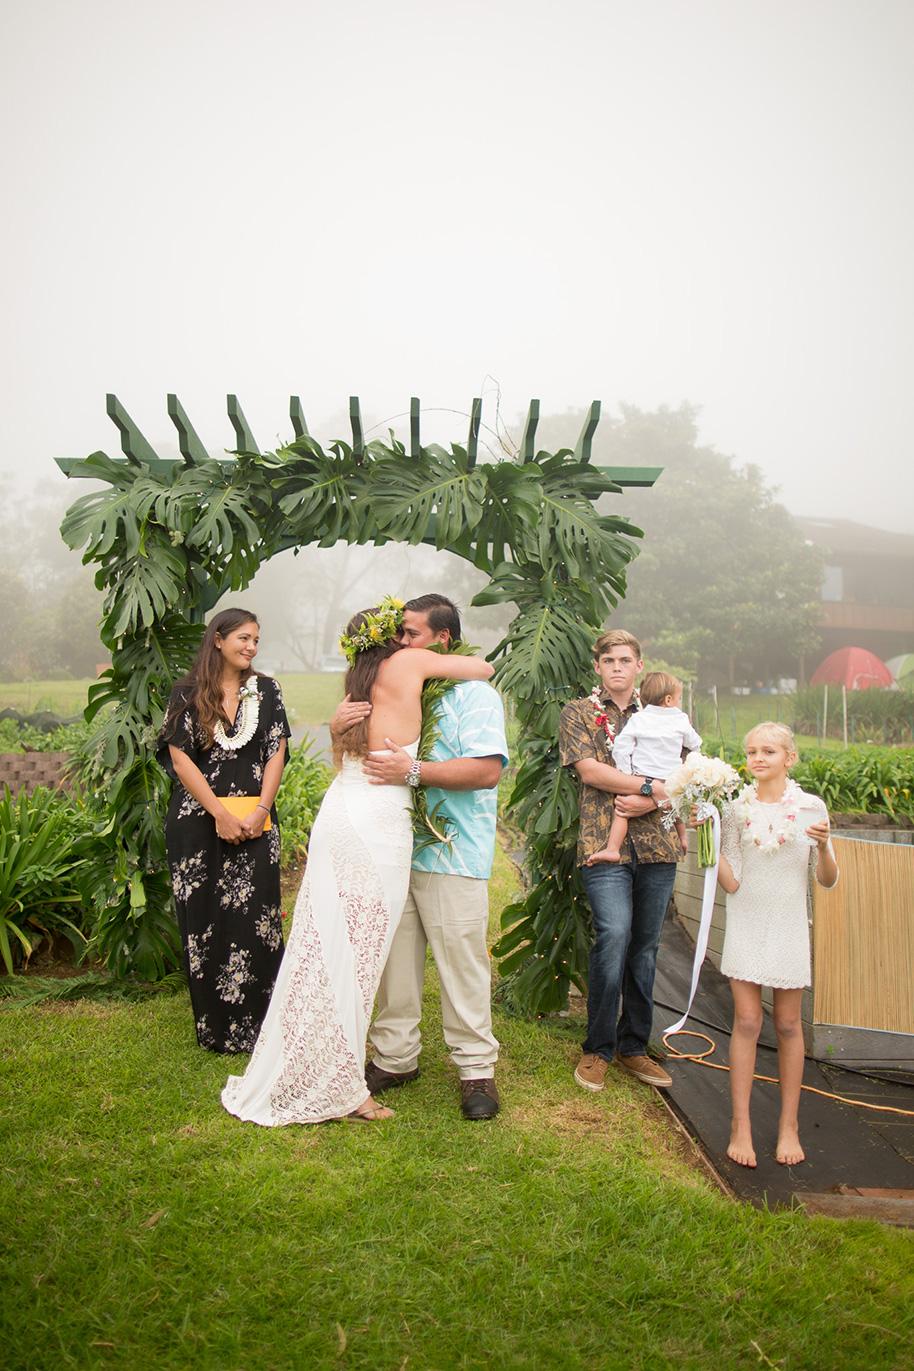 Maui-Ranch-Wedding-032717-12.jpg